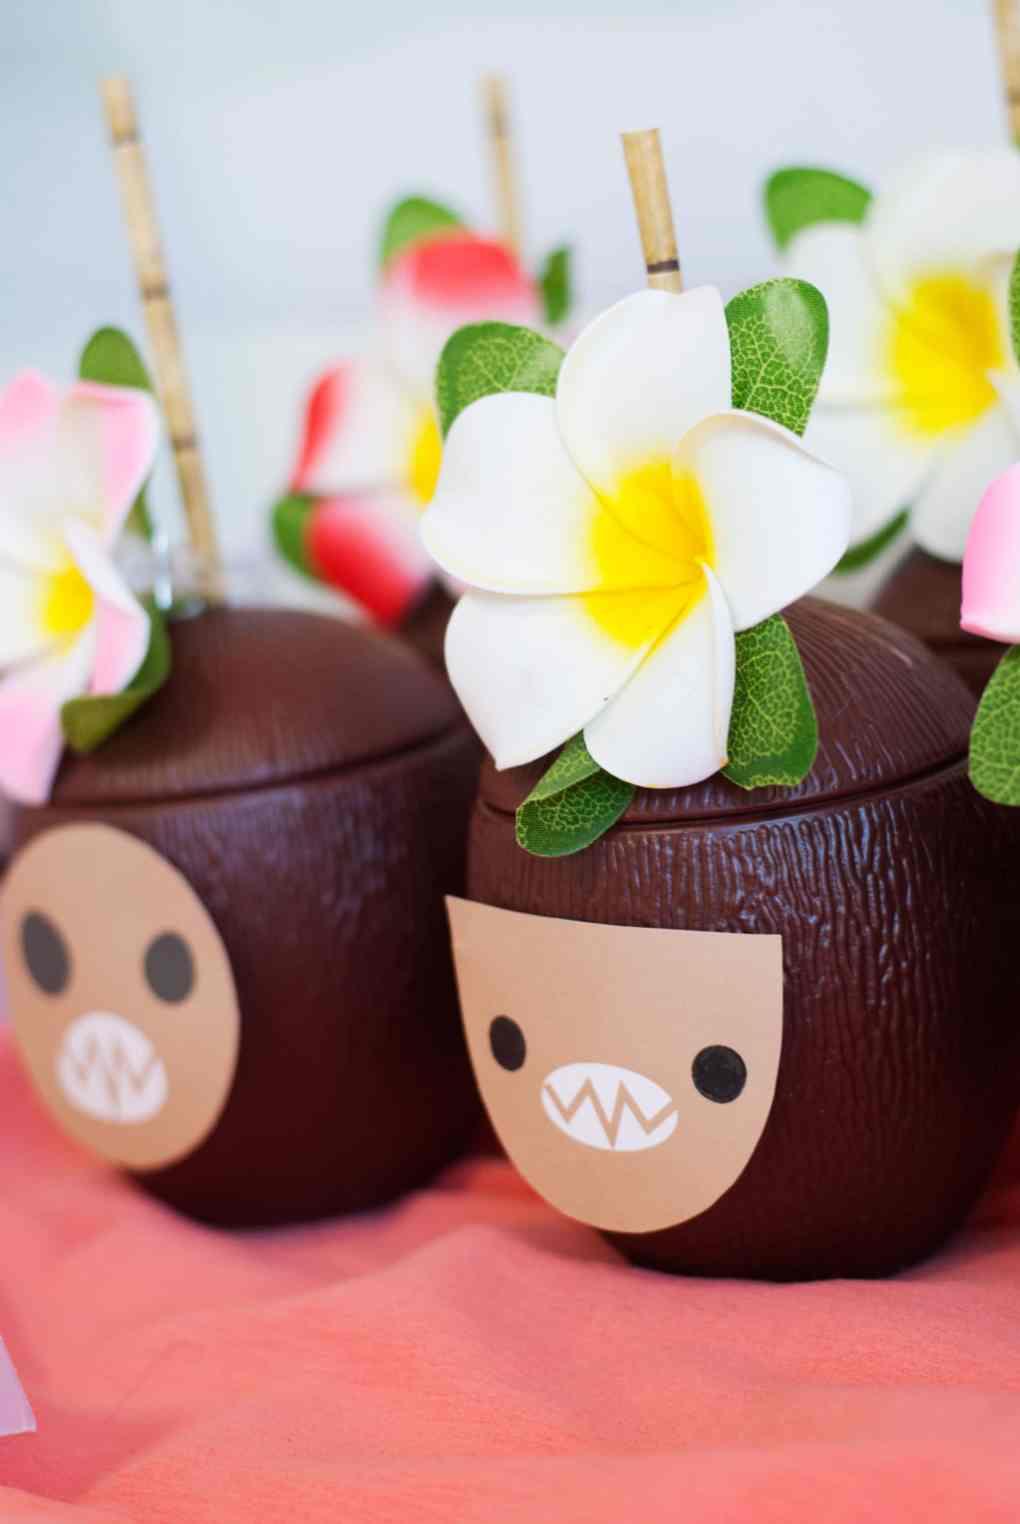 Moana Birthday Party Ideas Coconut Cups - Project Nursery